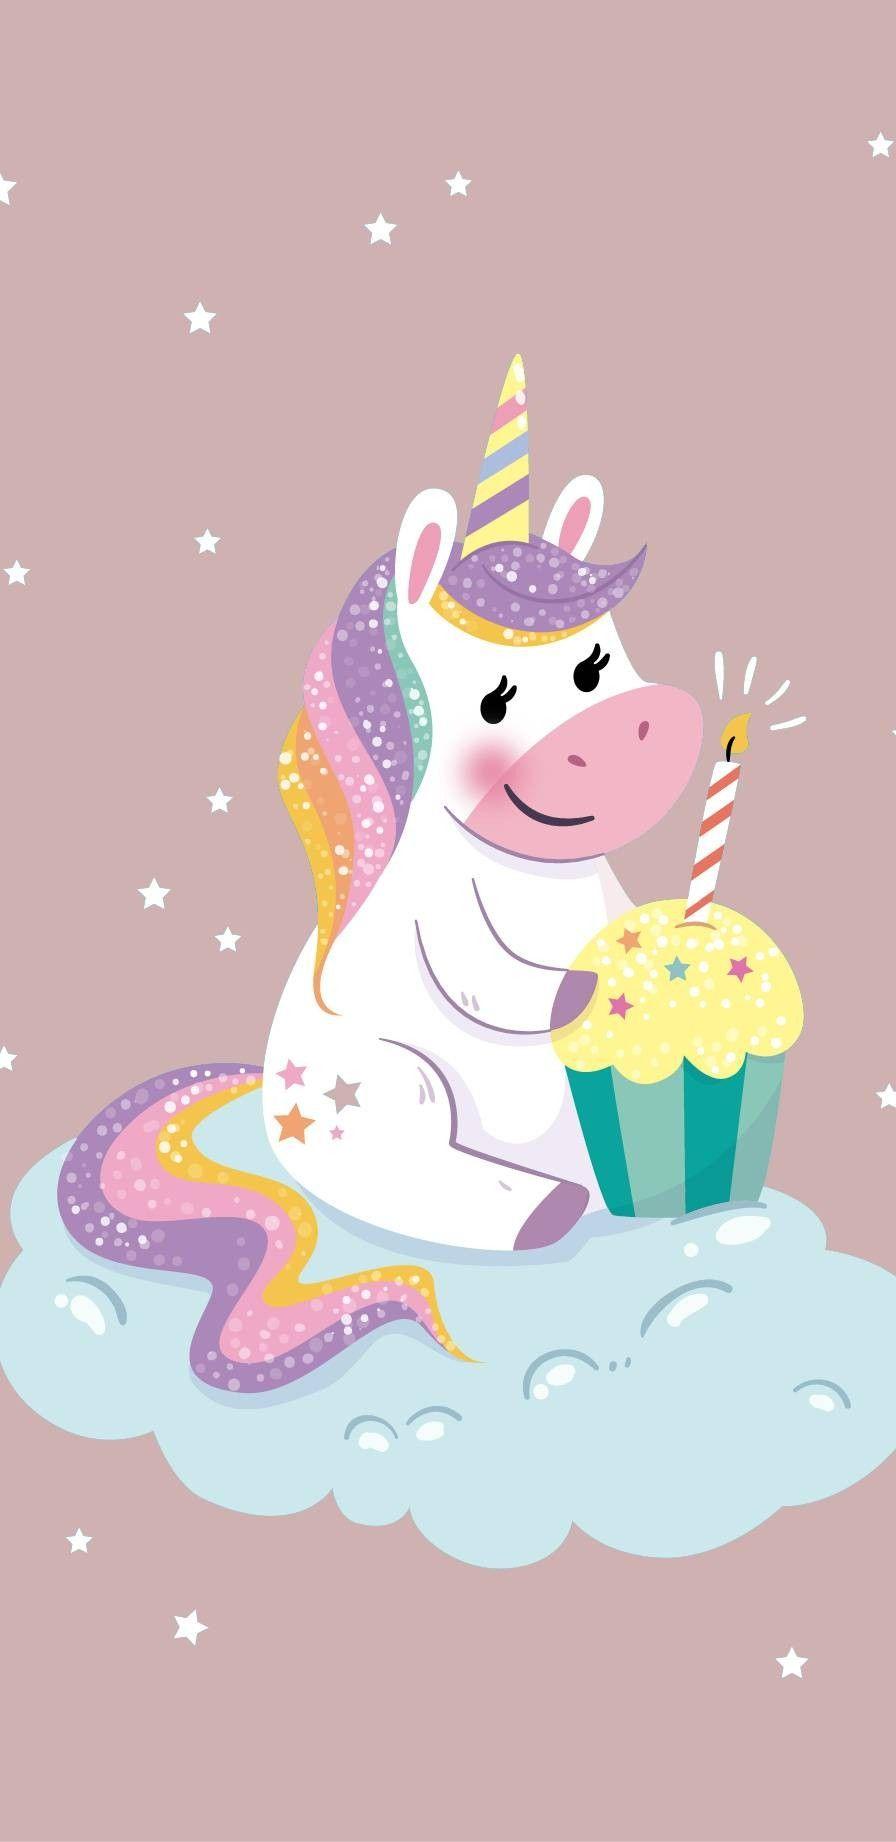 Unicorn Pink Unicorn Wallpaper Unicorn Wallpaper Birthday Wallpaper